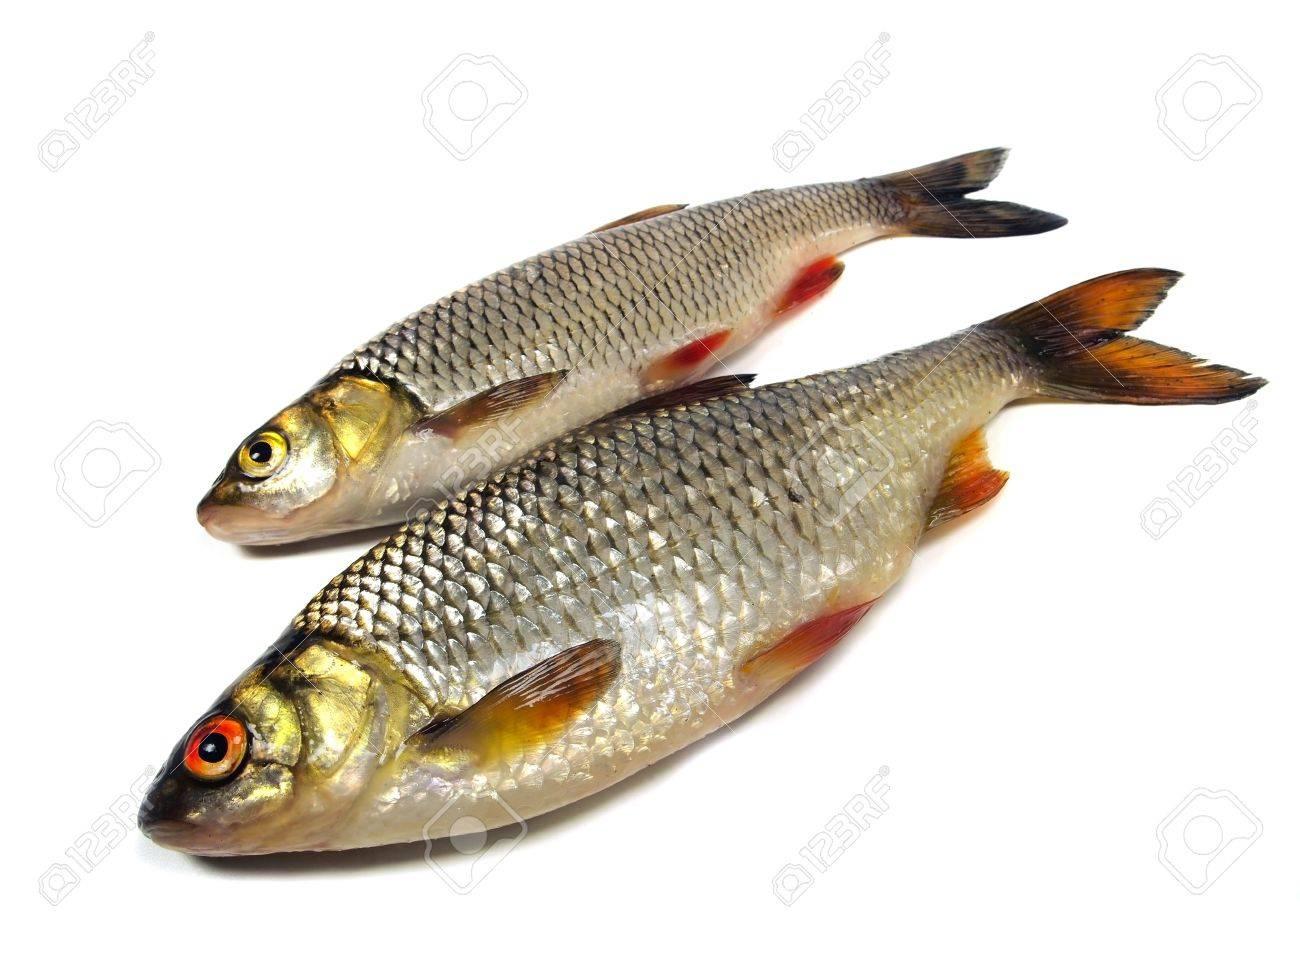 chub (leuciscus cephalus) and roach (Rutilus rutilus)  on a white background Stock Photo - 11171368